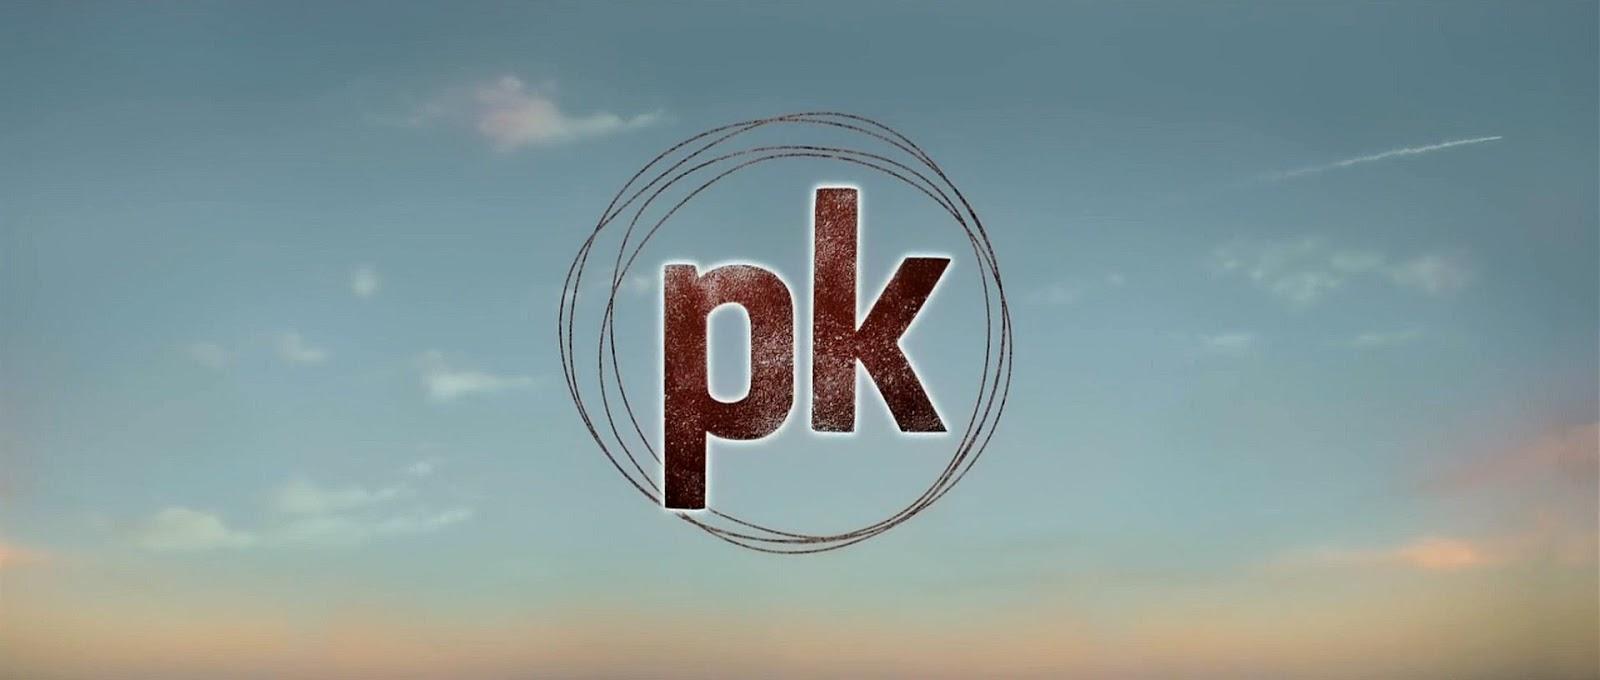 PK Hindi Movie Screenshot